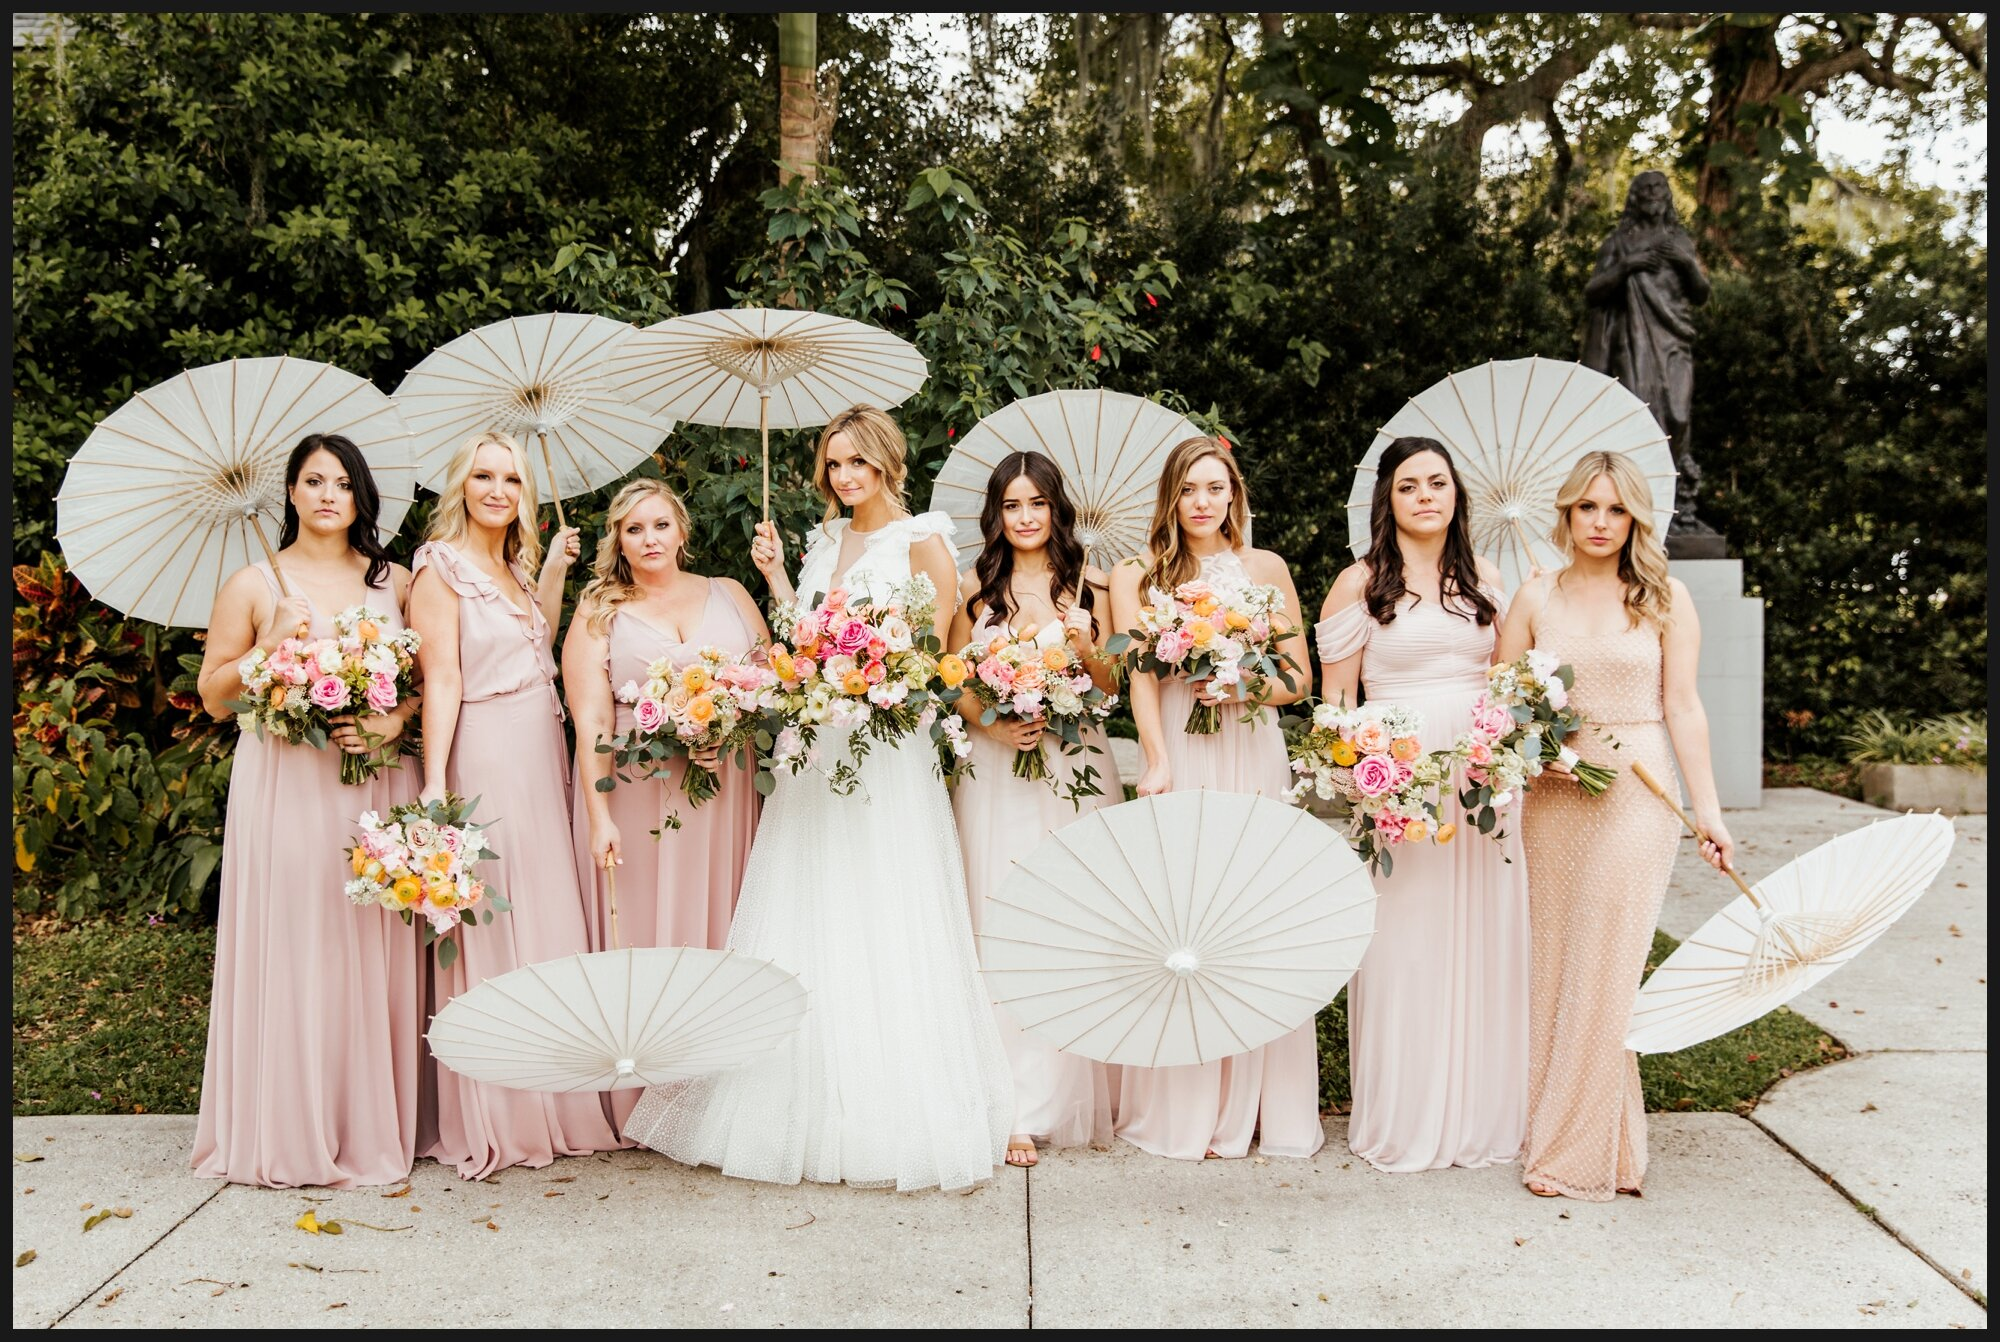 Orlando-Wedding-Photographer-destination-wedding-photographer-florida-wedding-photographer-hawaii-wedding-photographer_0747.jpg